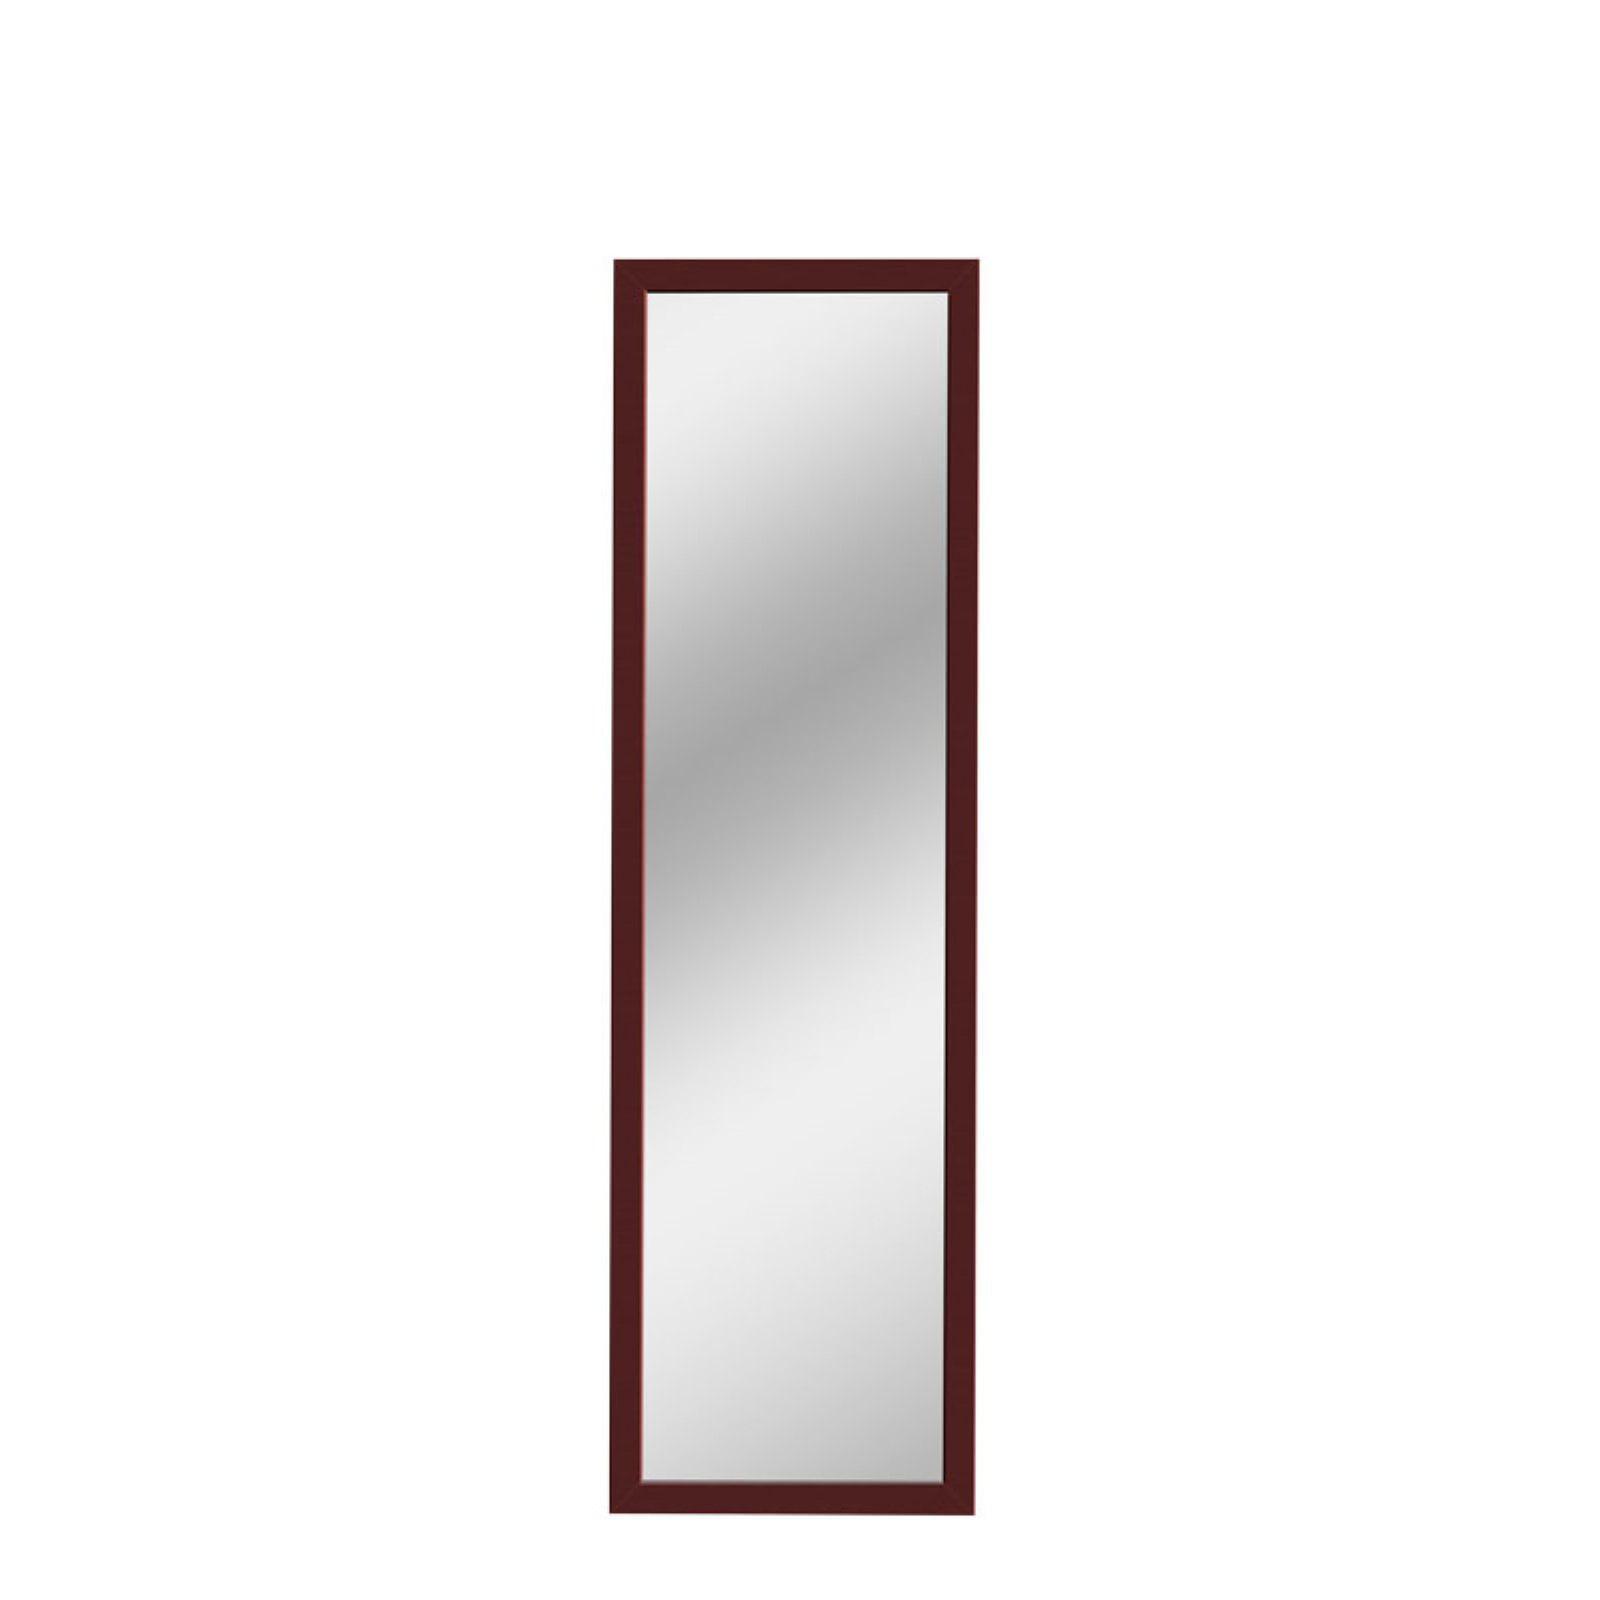 Mirrotek Large Over the Door / Wall Mounted Hanging Mirror